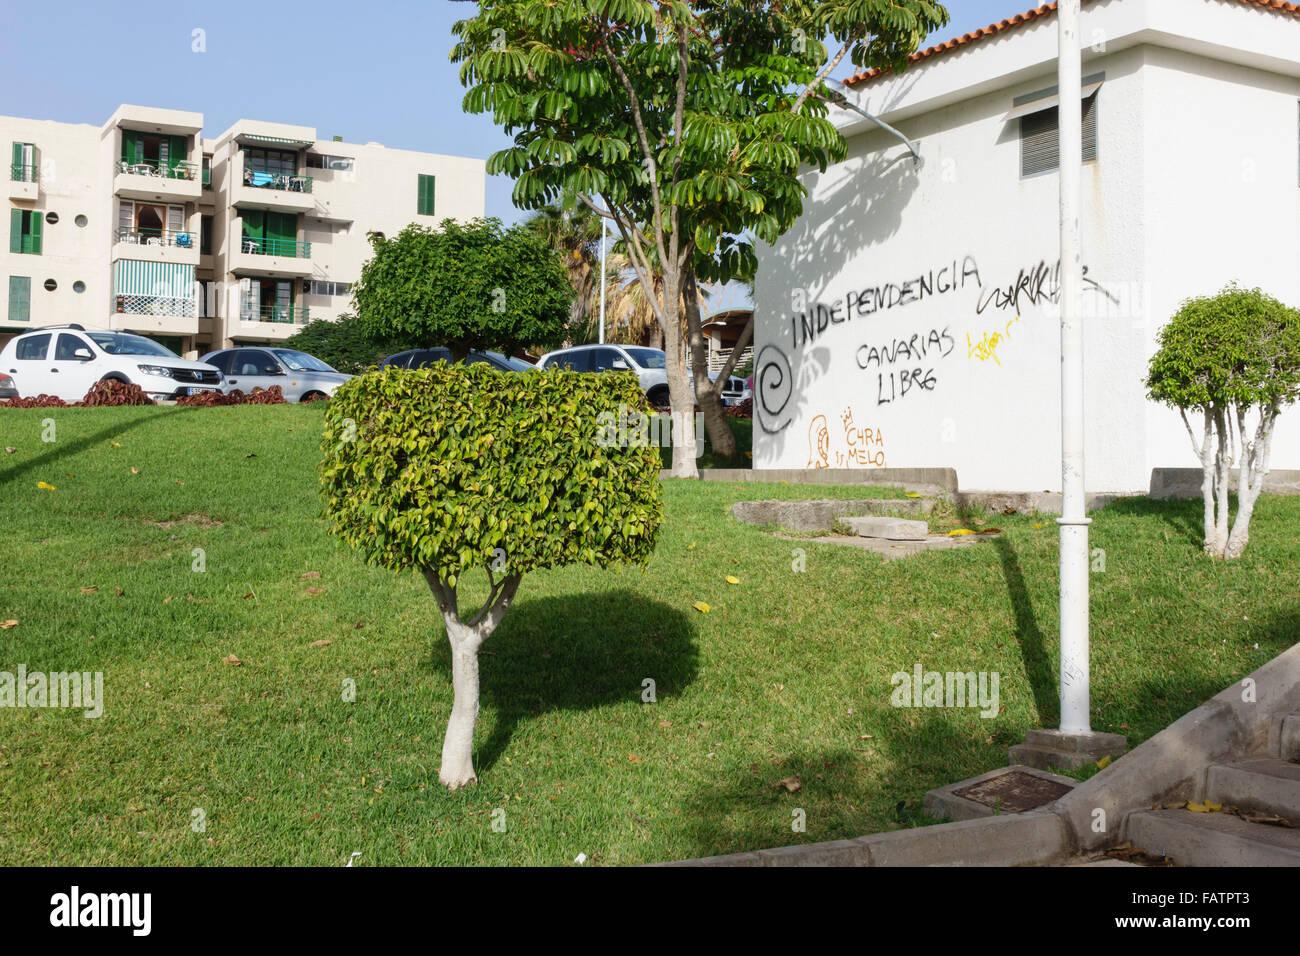 Tenerife, Canary Islands - Playa las Americas. Canarias libras independence graffiti. - Stock Image